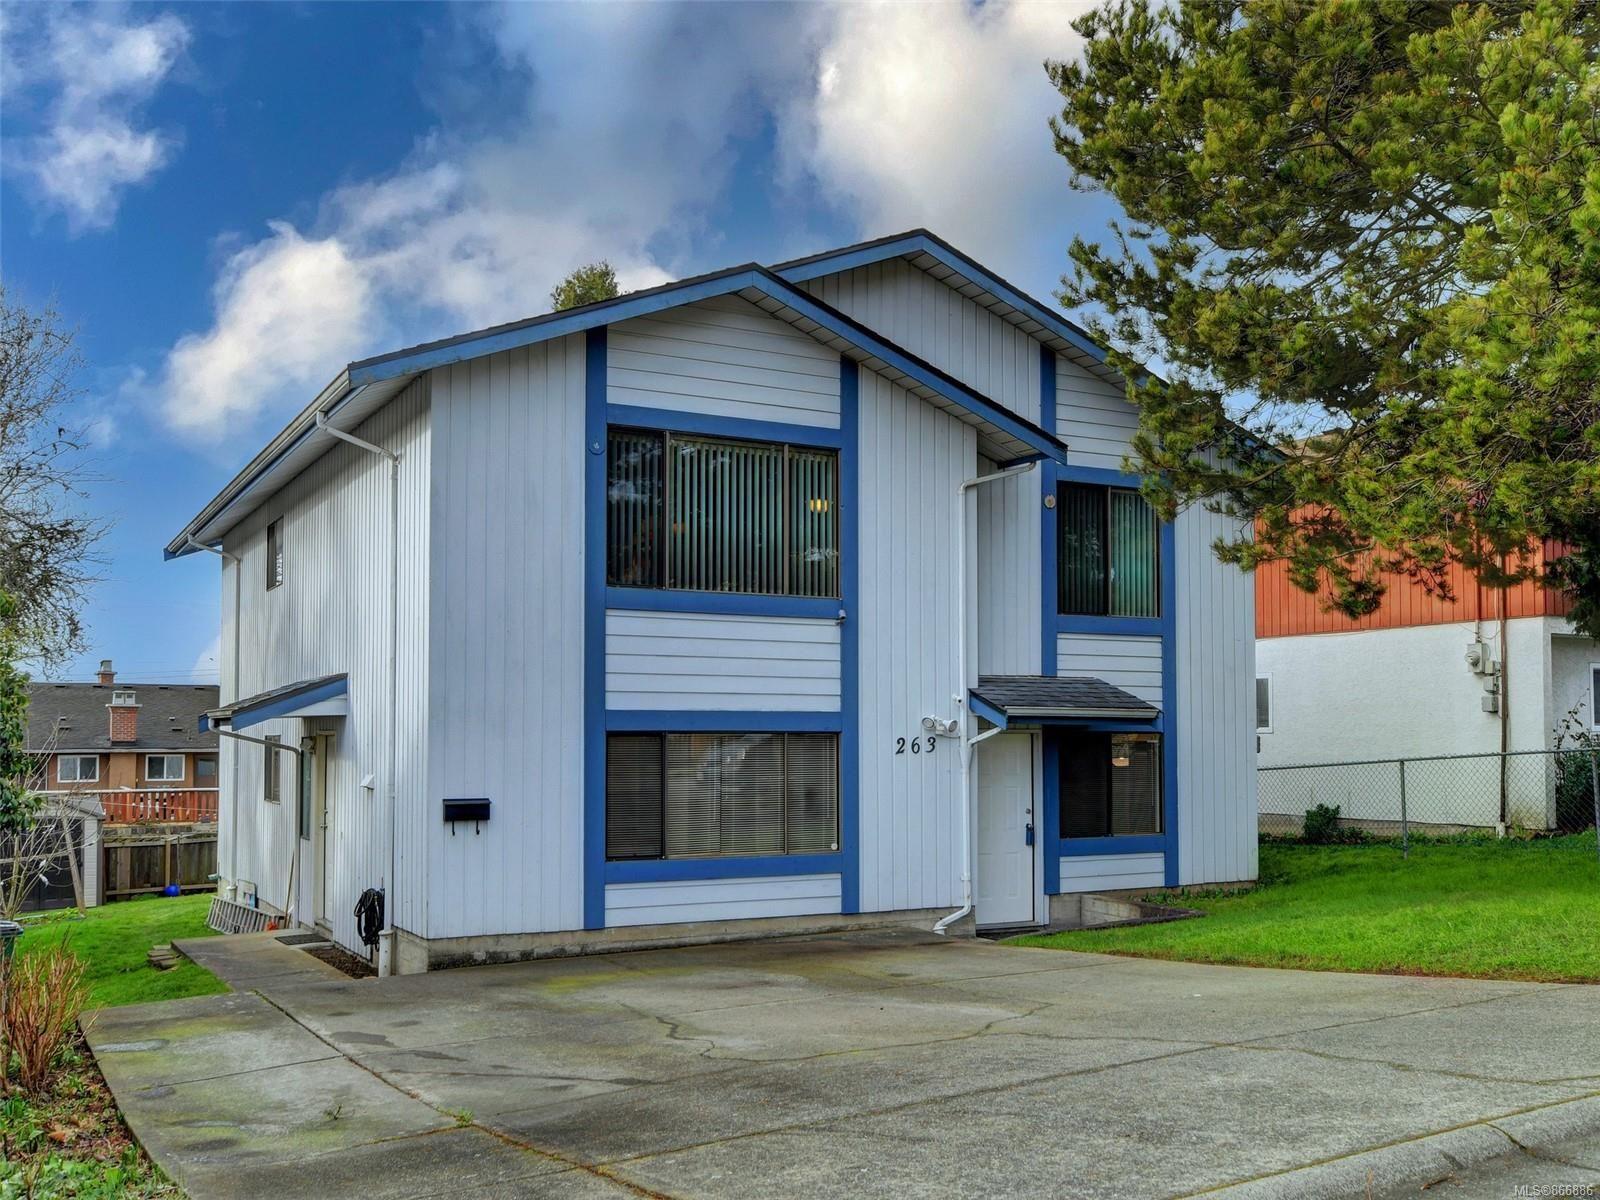 Main Photo: 263 Battleford Ave in Saanich: SW Tillicum House for sale (Saanich West)  : MLS®# 866886